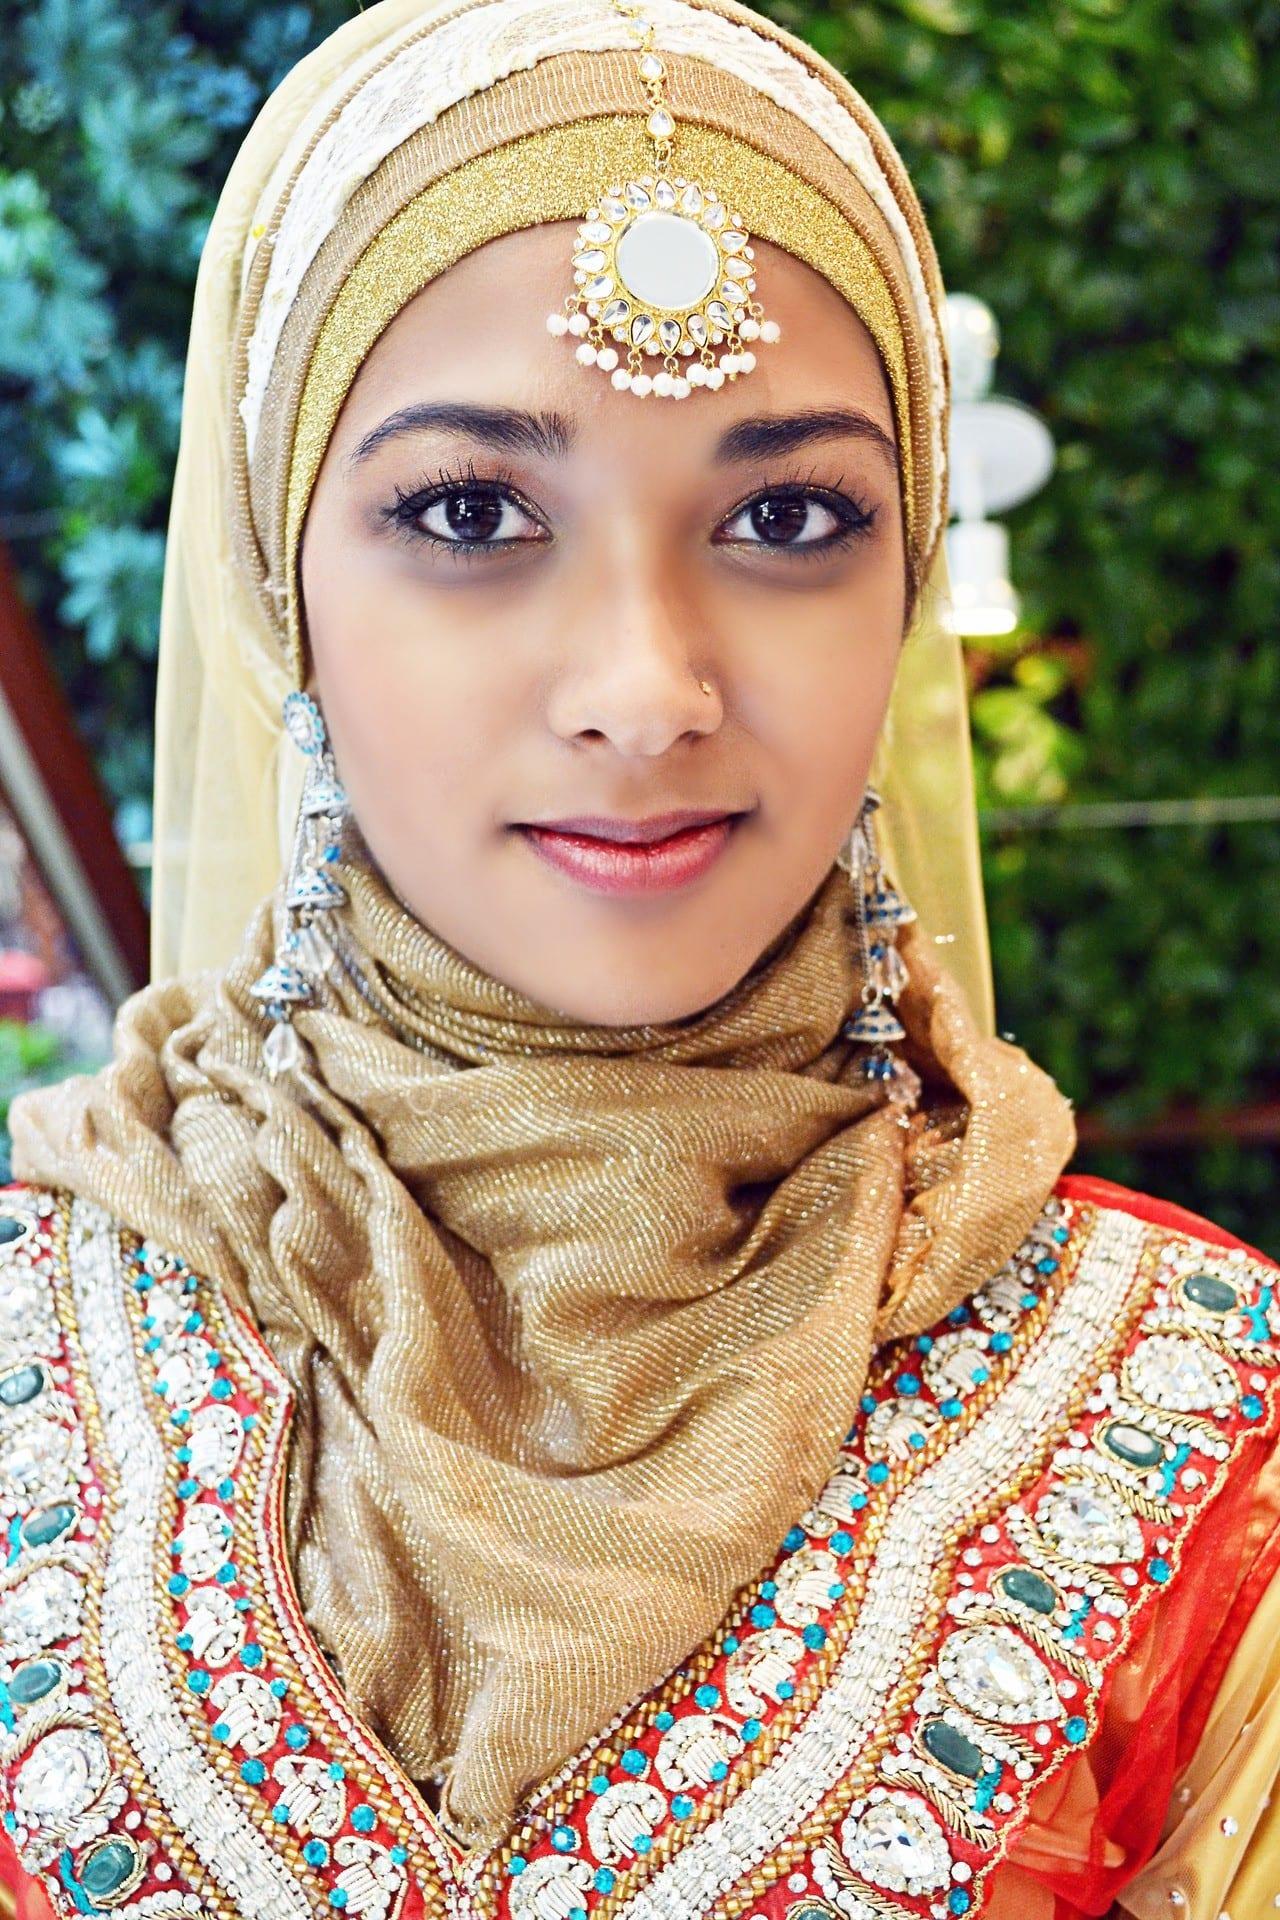 tumblr_mr9rozThqG1s5bjico1_1280 Hijab Earring Style - 16 Ideas to Wear Earrings with Hijab